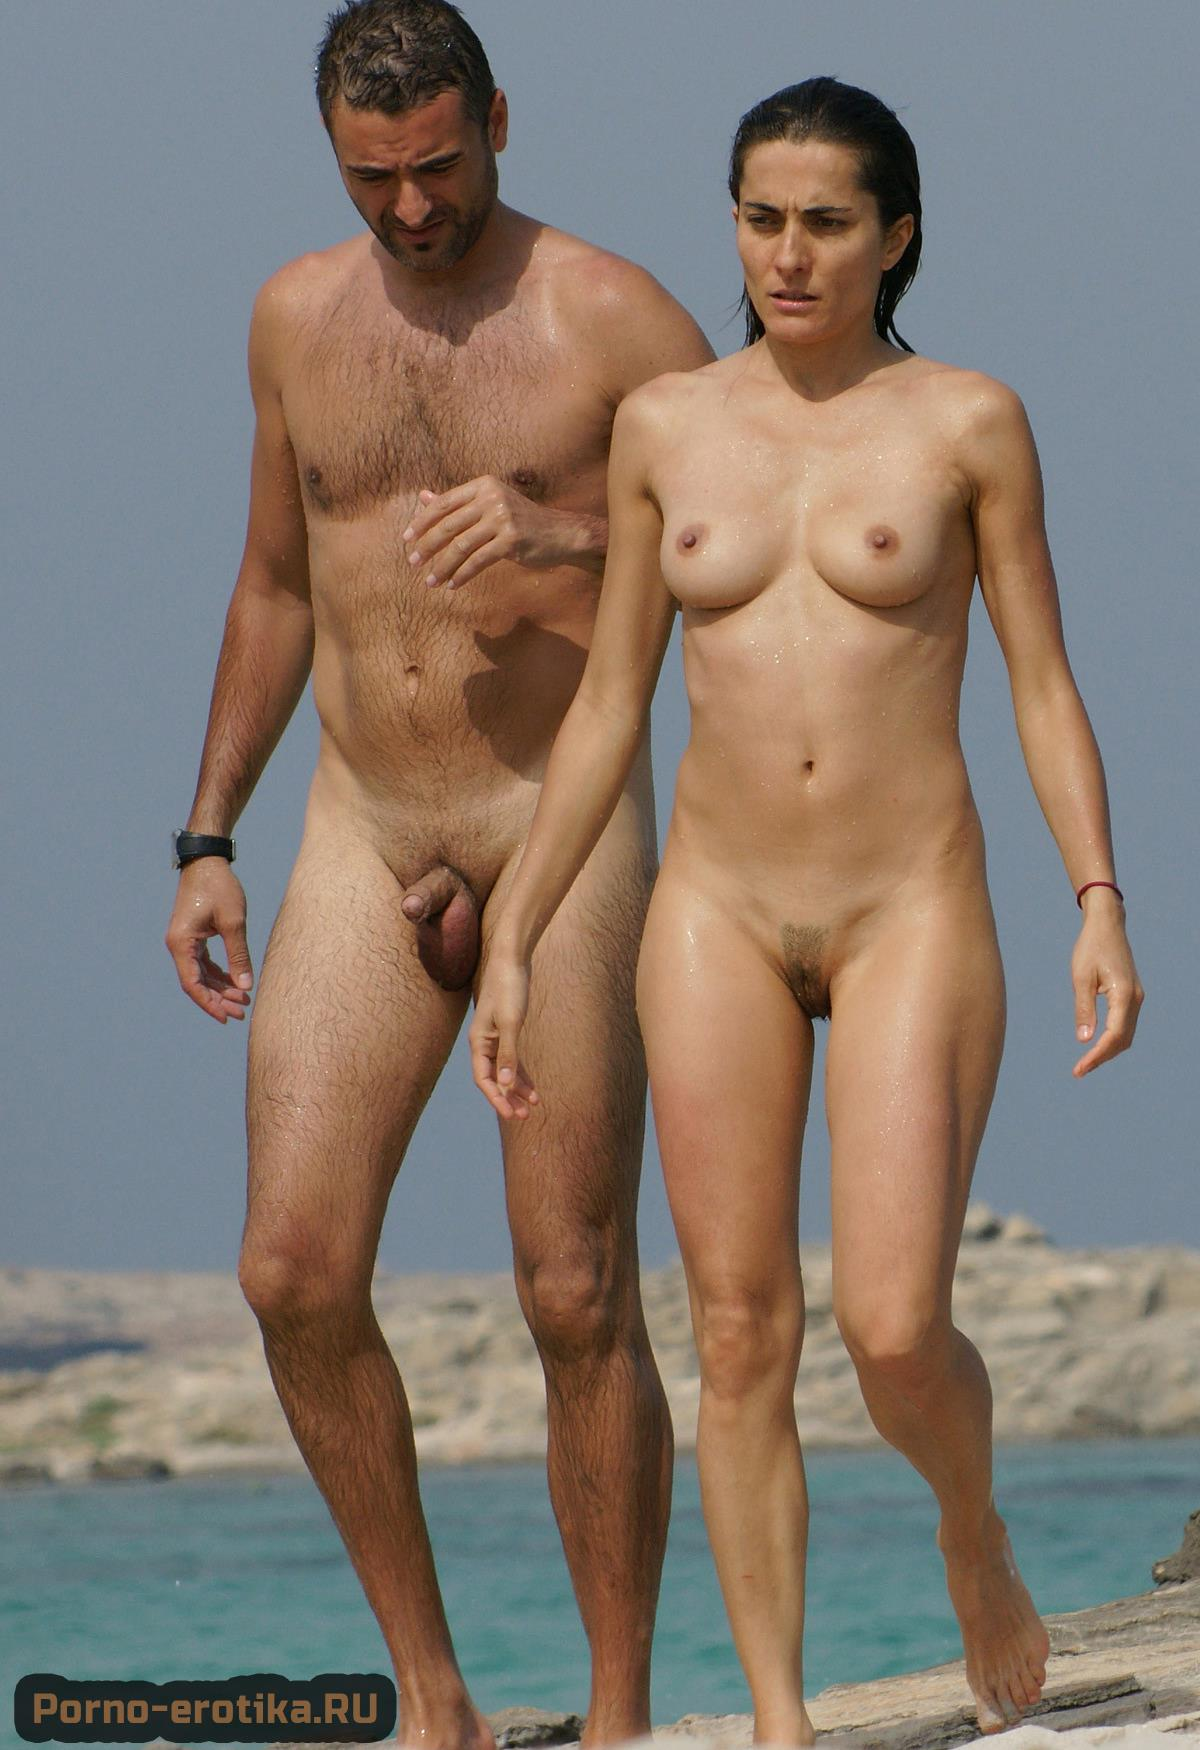 Зрелая пара нудистов фото фото 556-342